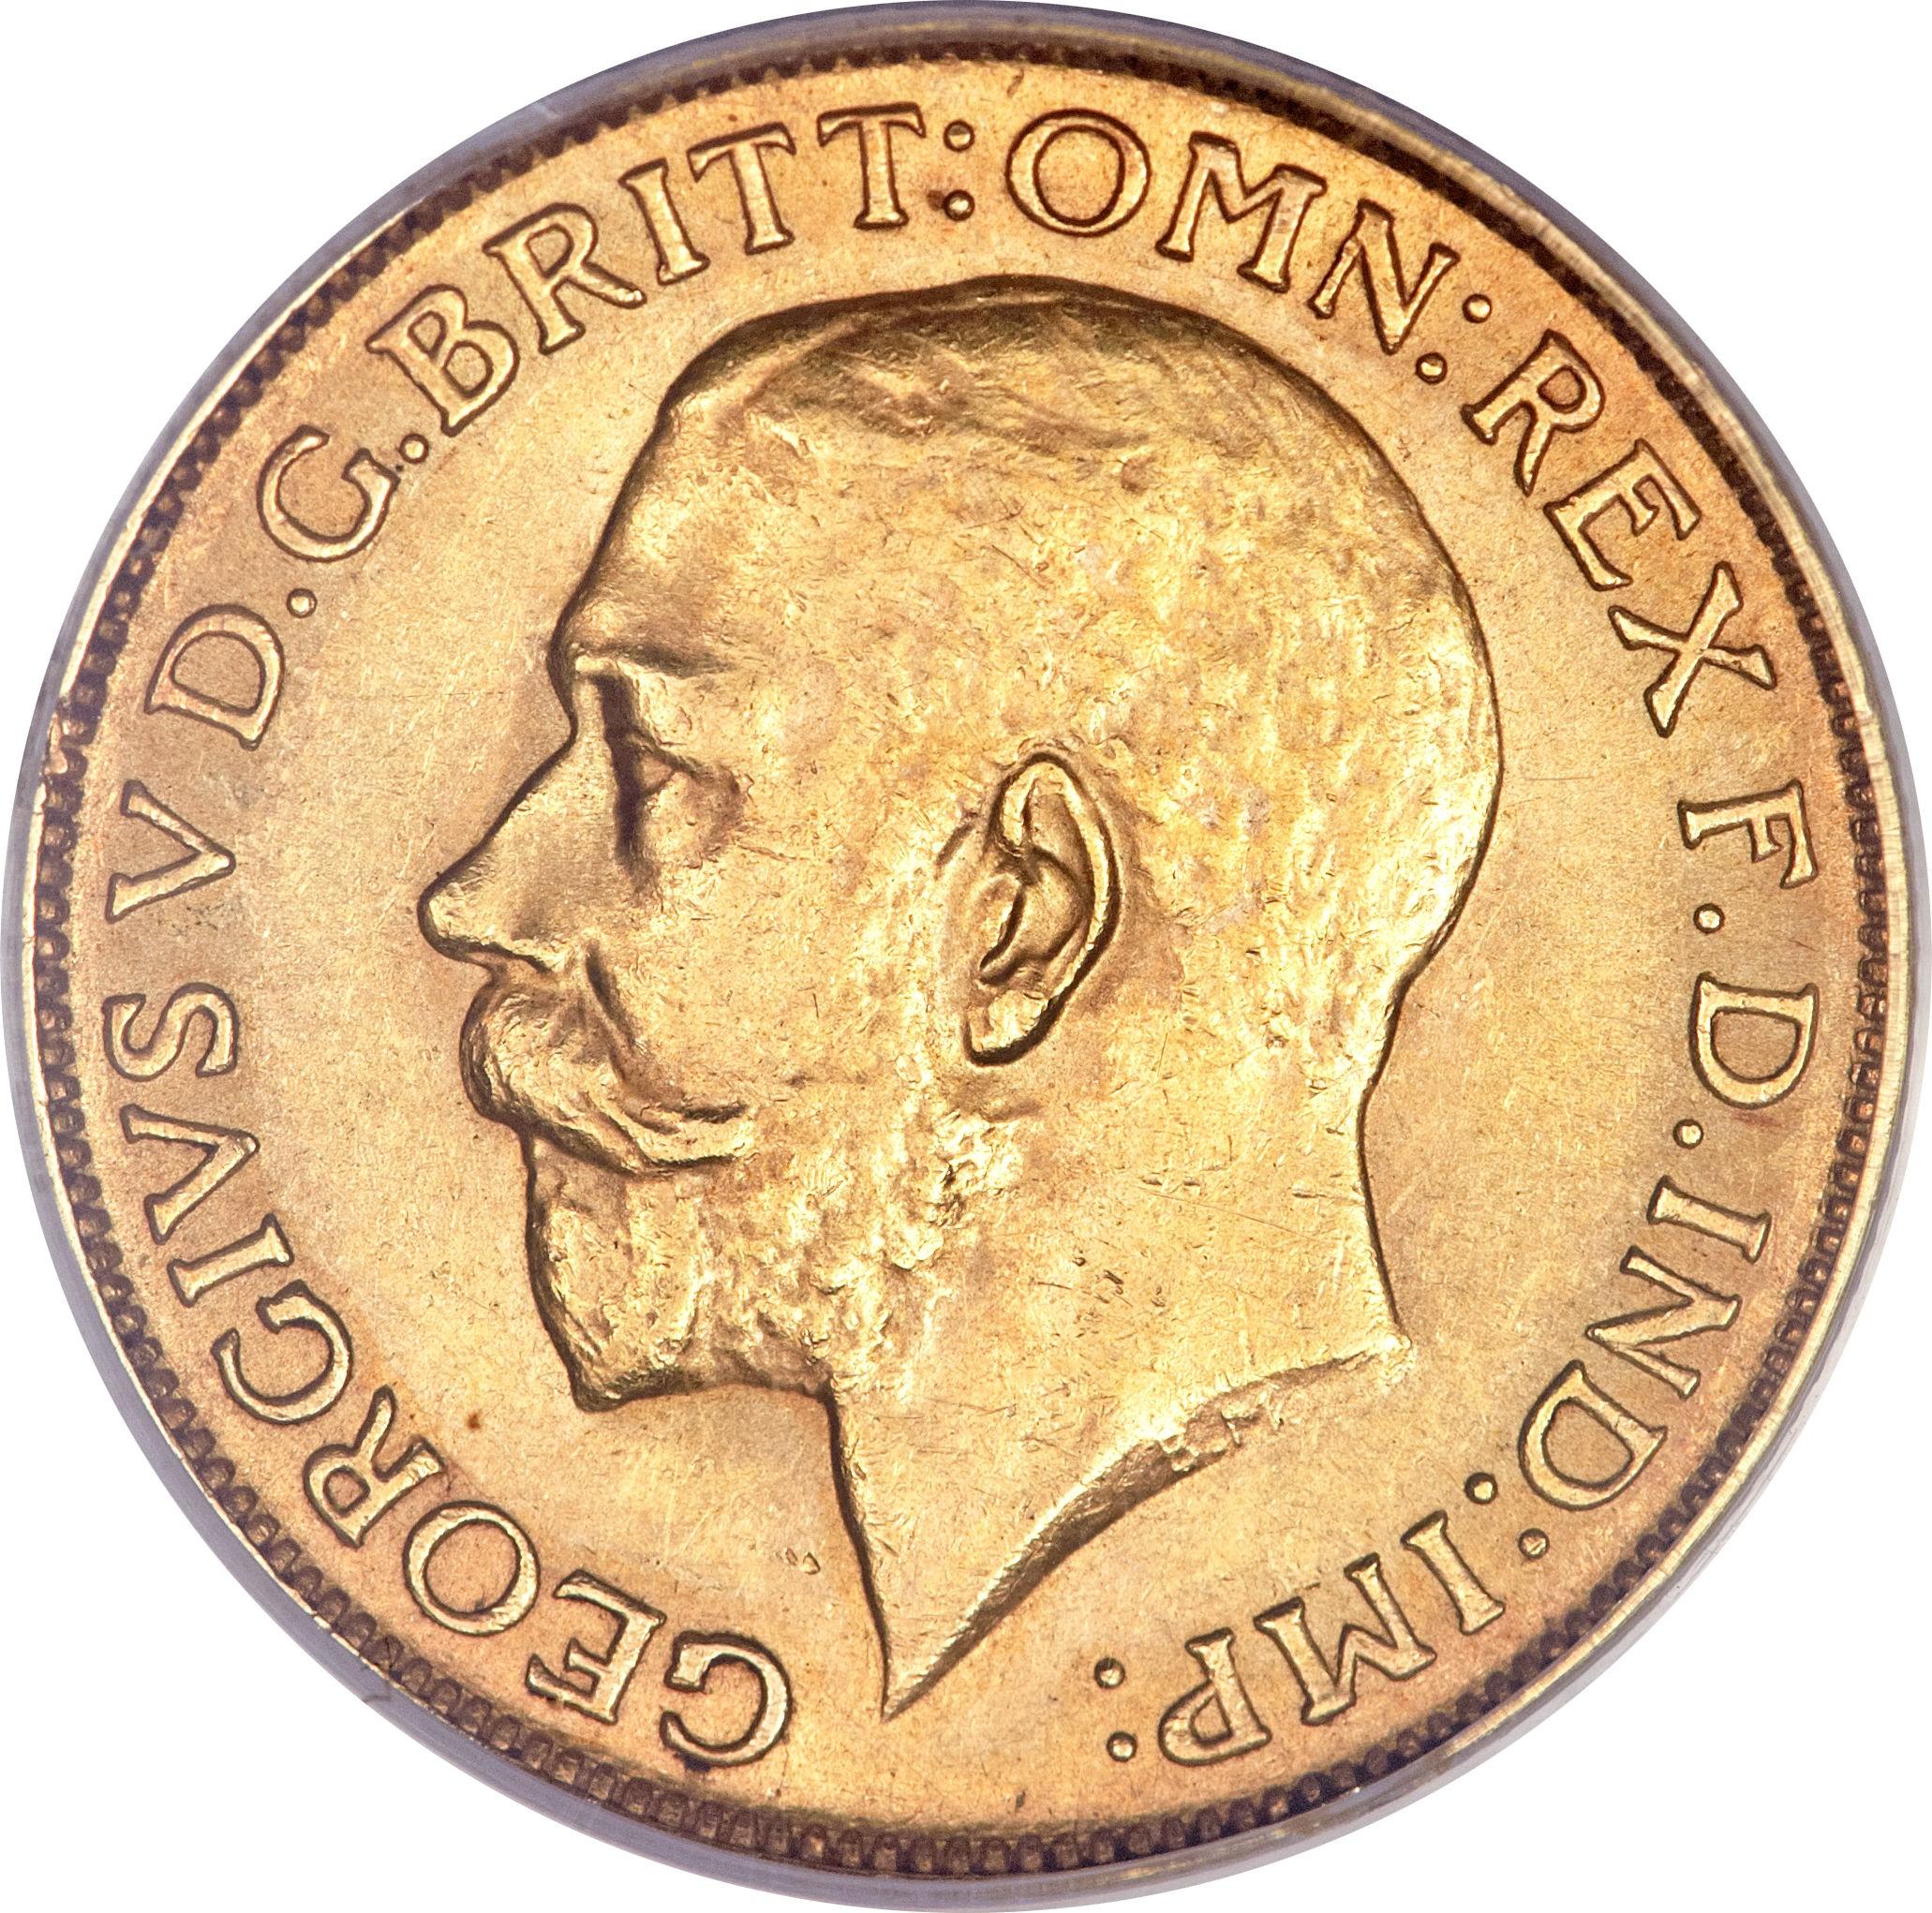 South Africa 1 Sovereign (1923-1928 George V)